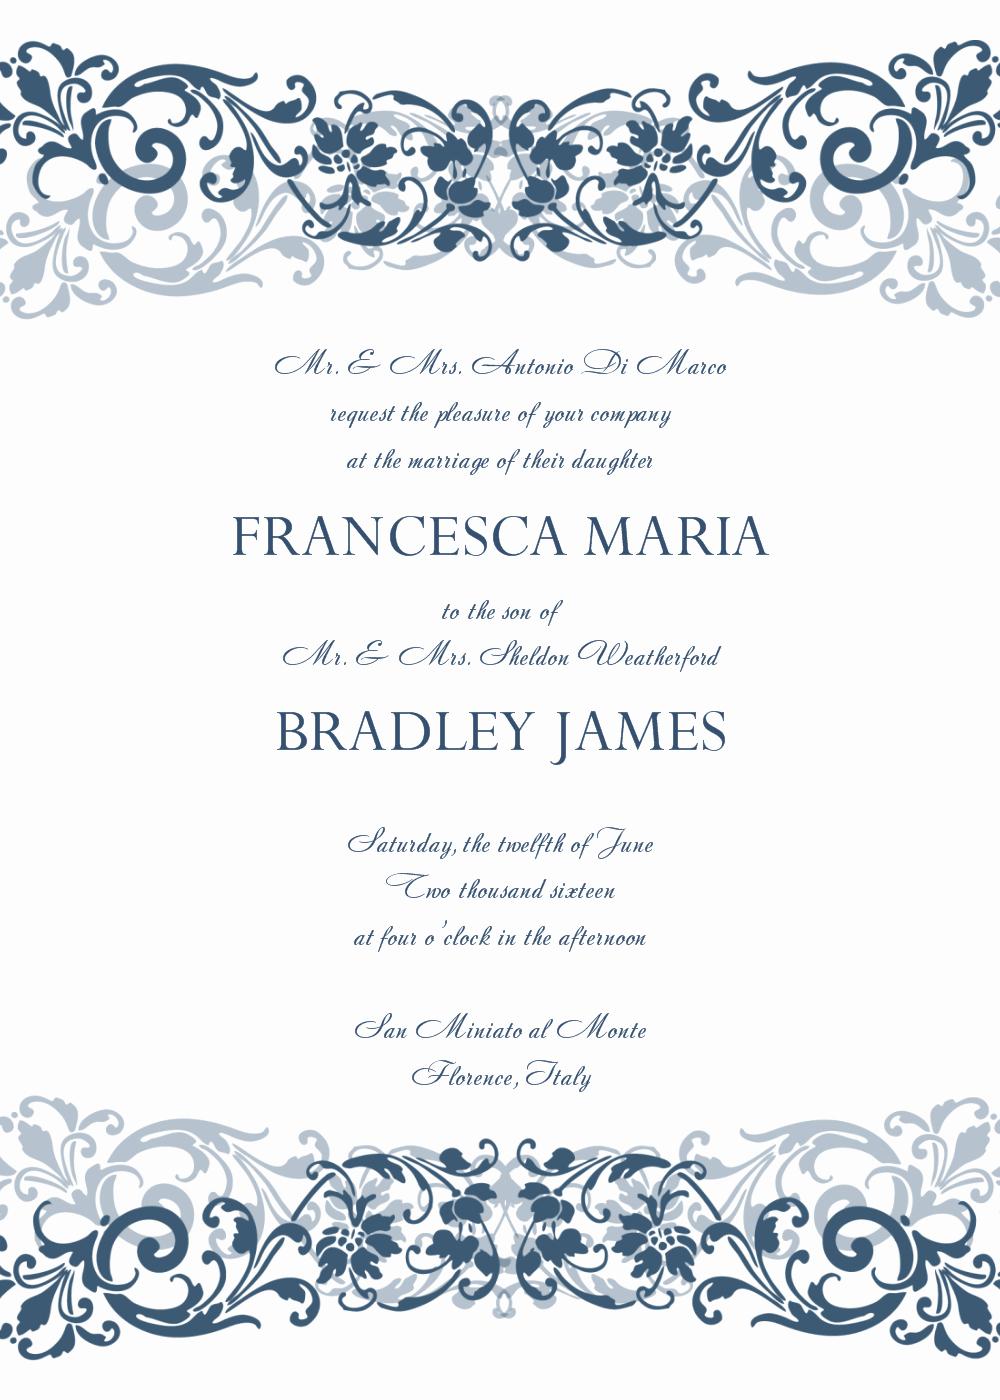 Microsoft Word Template for Invitations Fresh 8 Free Wedding Invitation Templates Excel Pdf formats